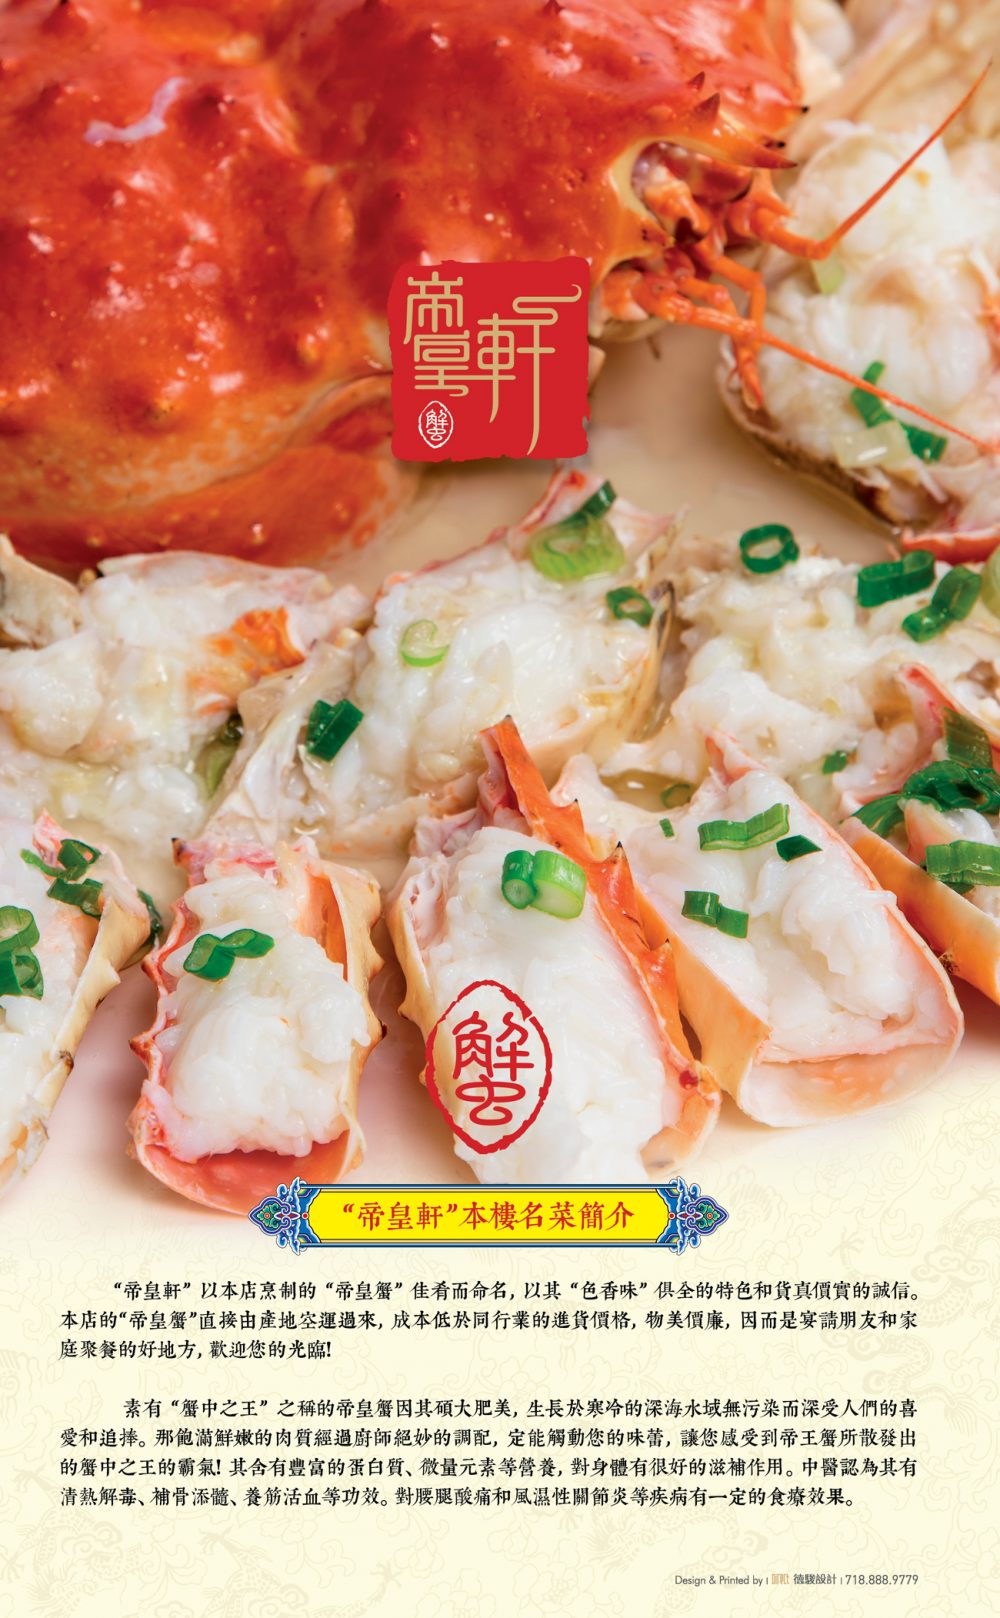 king-crab-house_DIM_